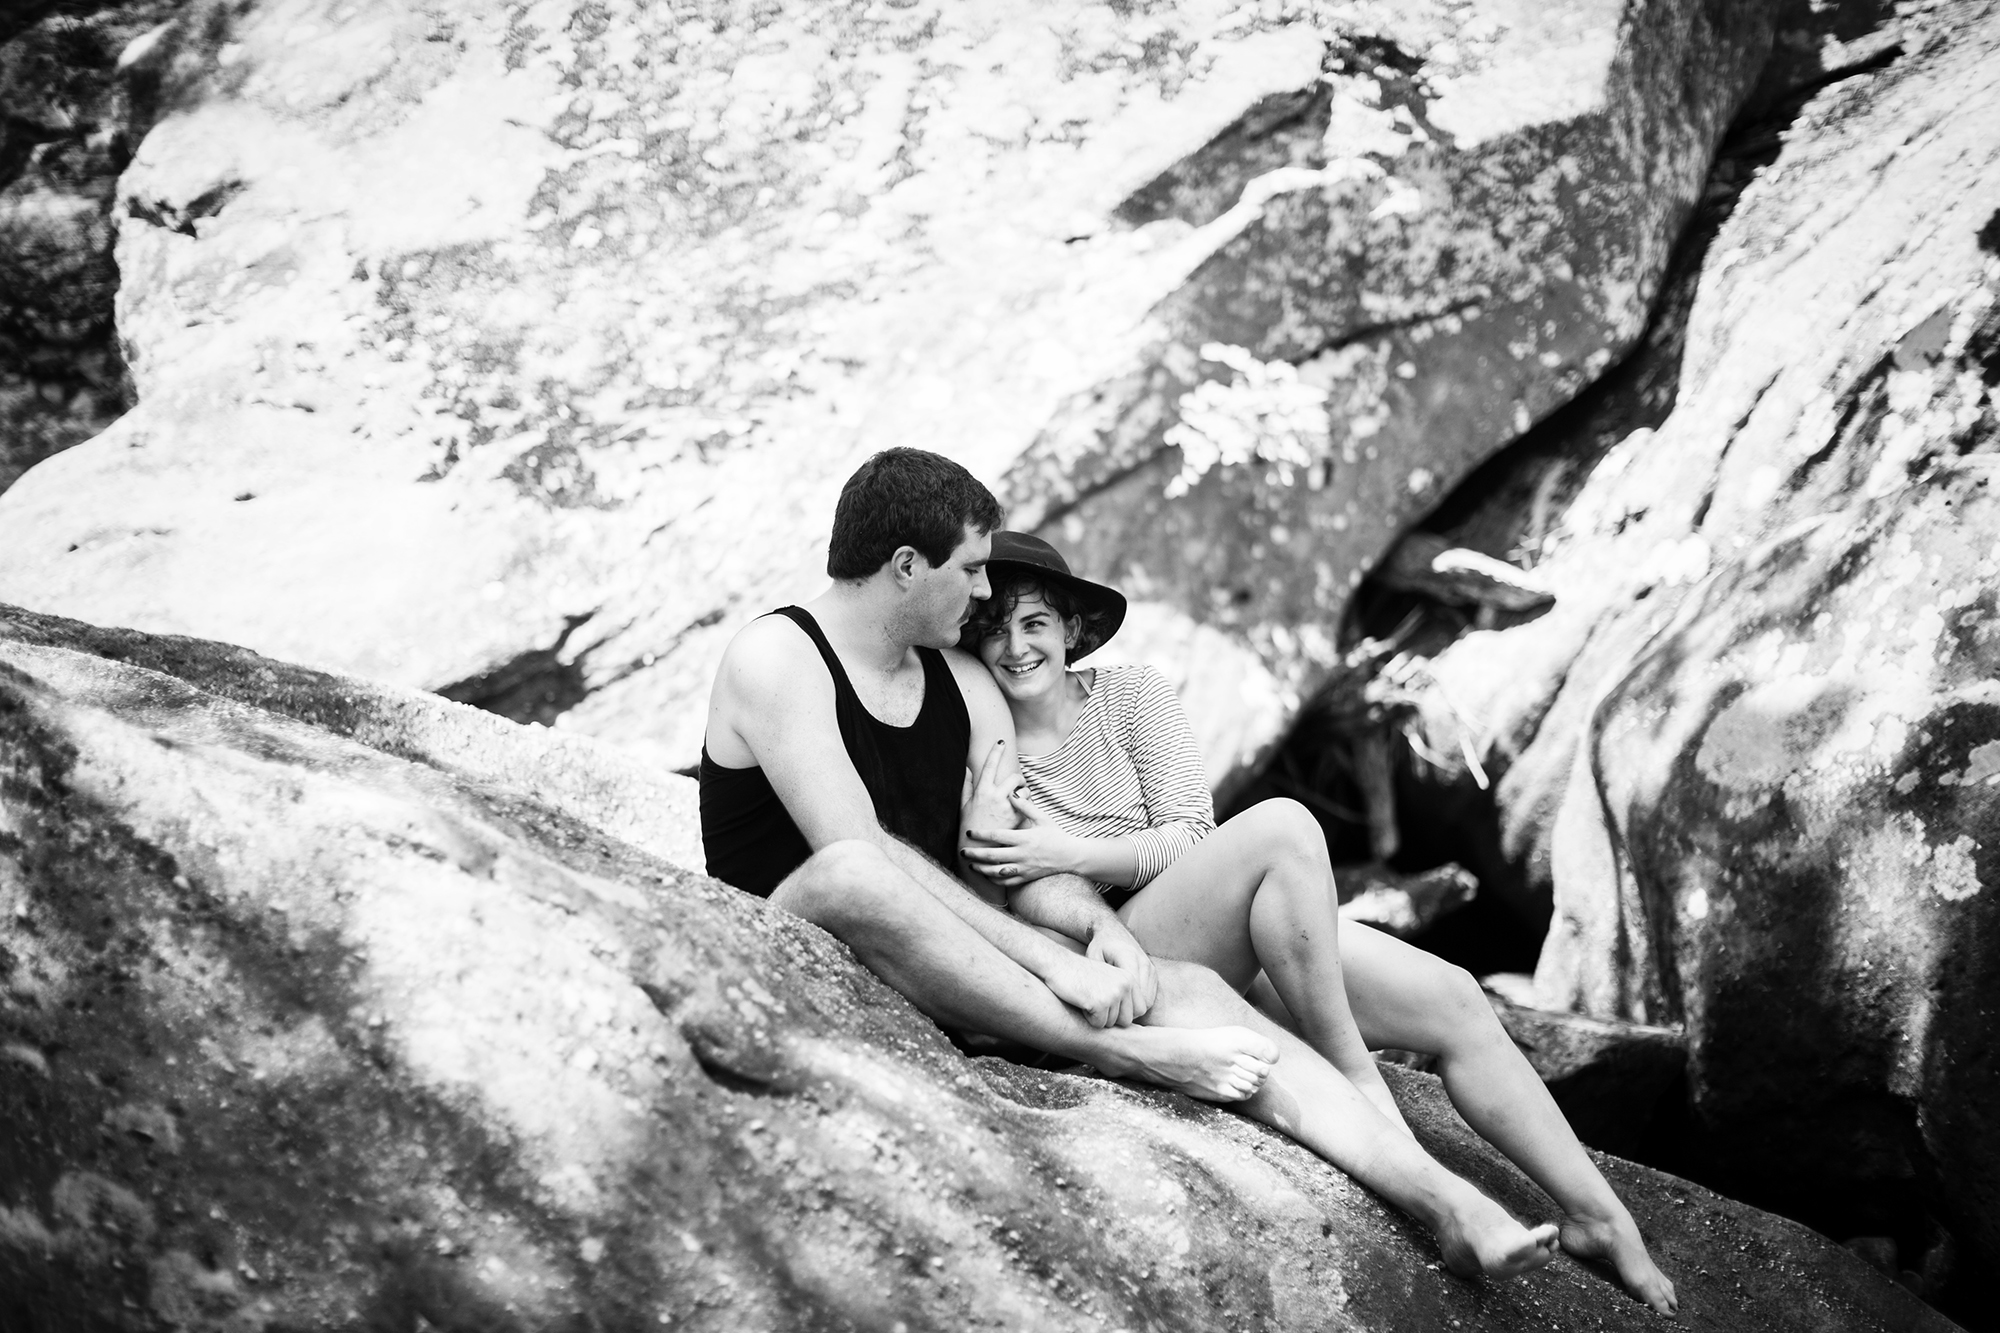 Seriously_Sabrina_Photography_Outdoor_Adventure_Engagement_Cumberland_Falls_SD8.jpg